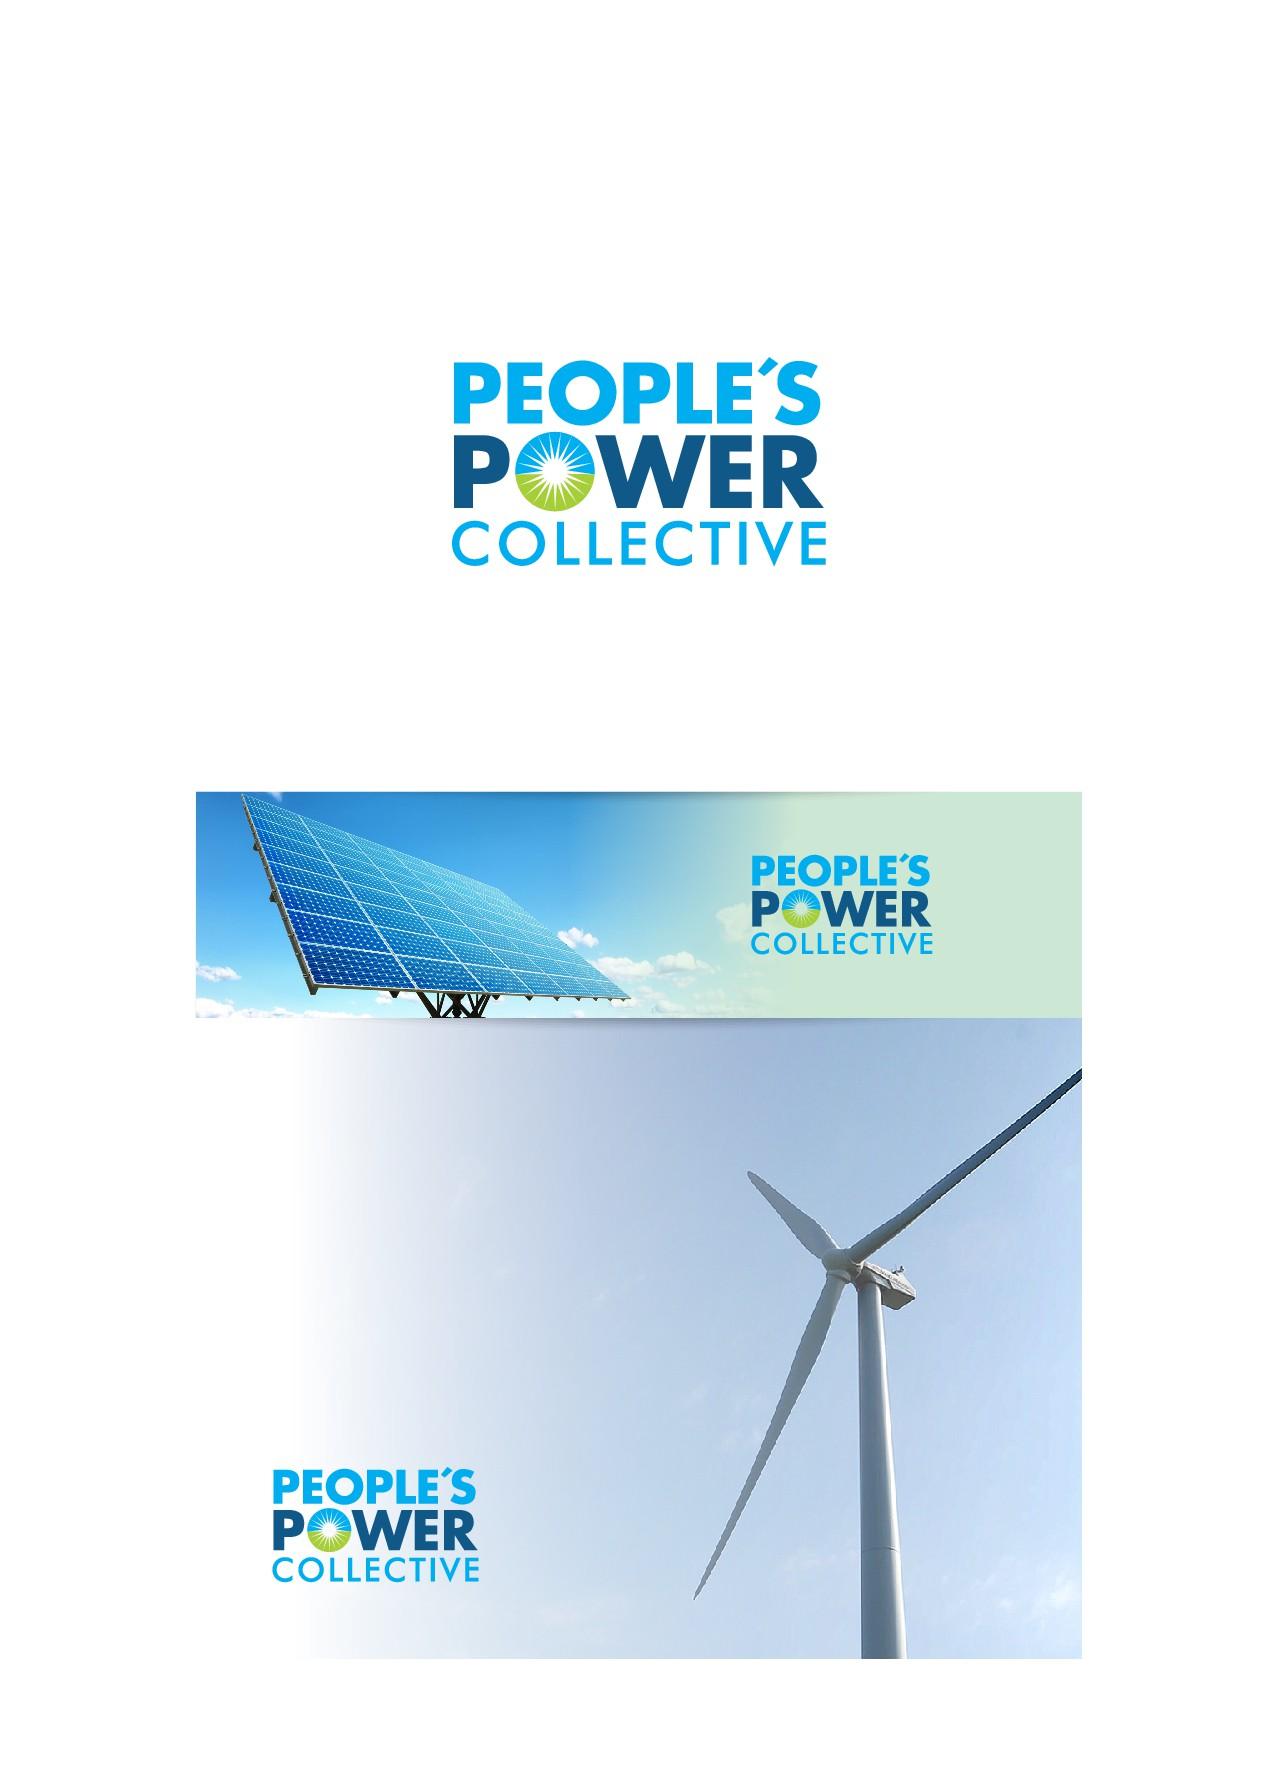 Logo Design for Renewable Energy Marketing Company